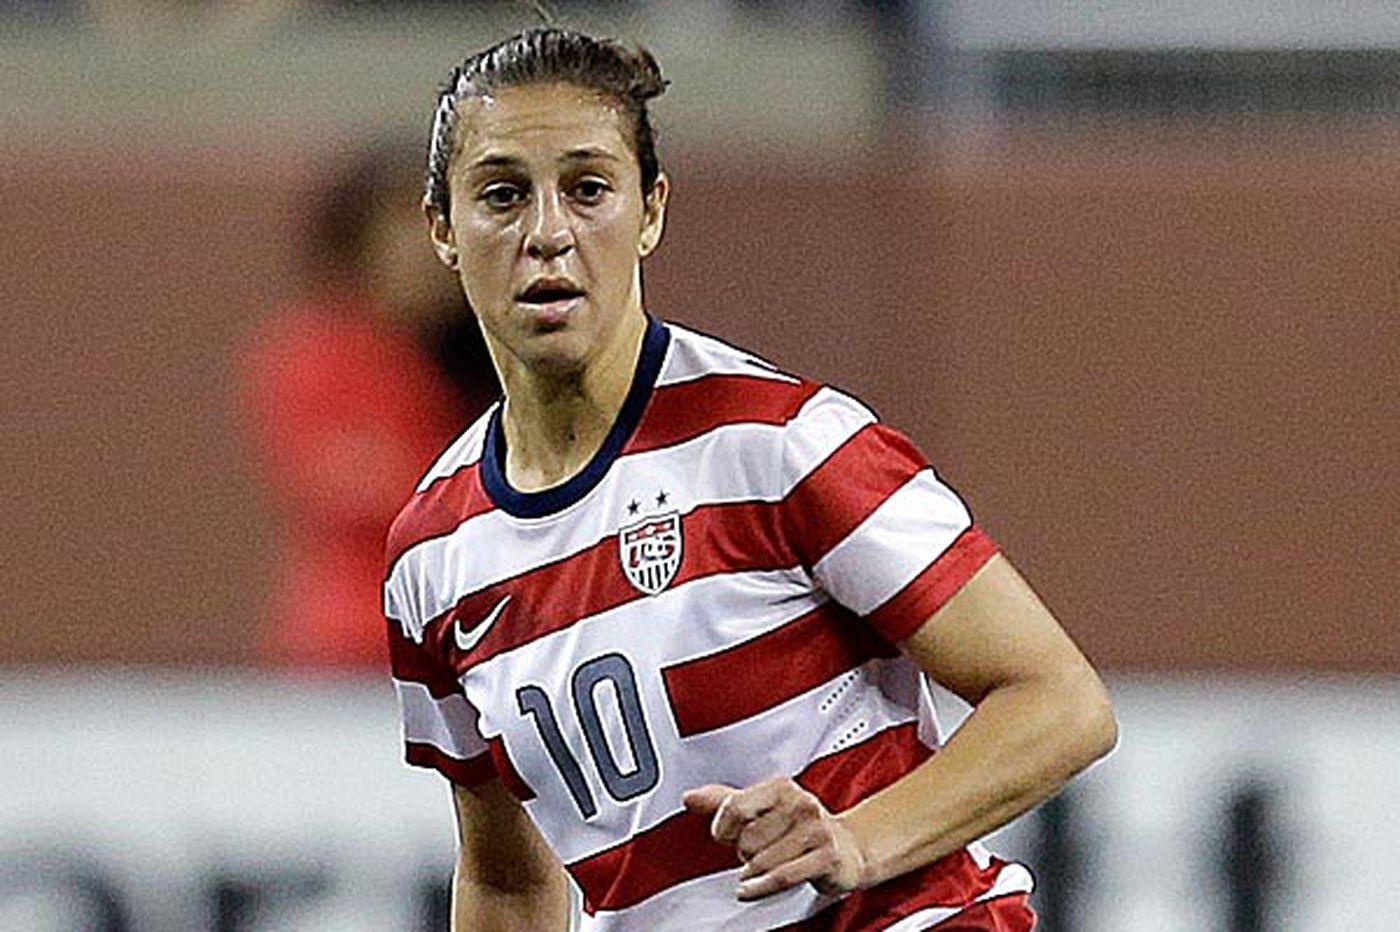 Lloyd ready to return to U.S. women's national soccer team